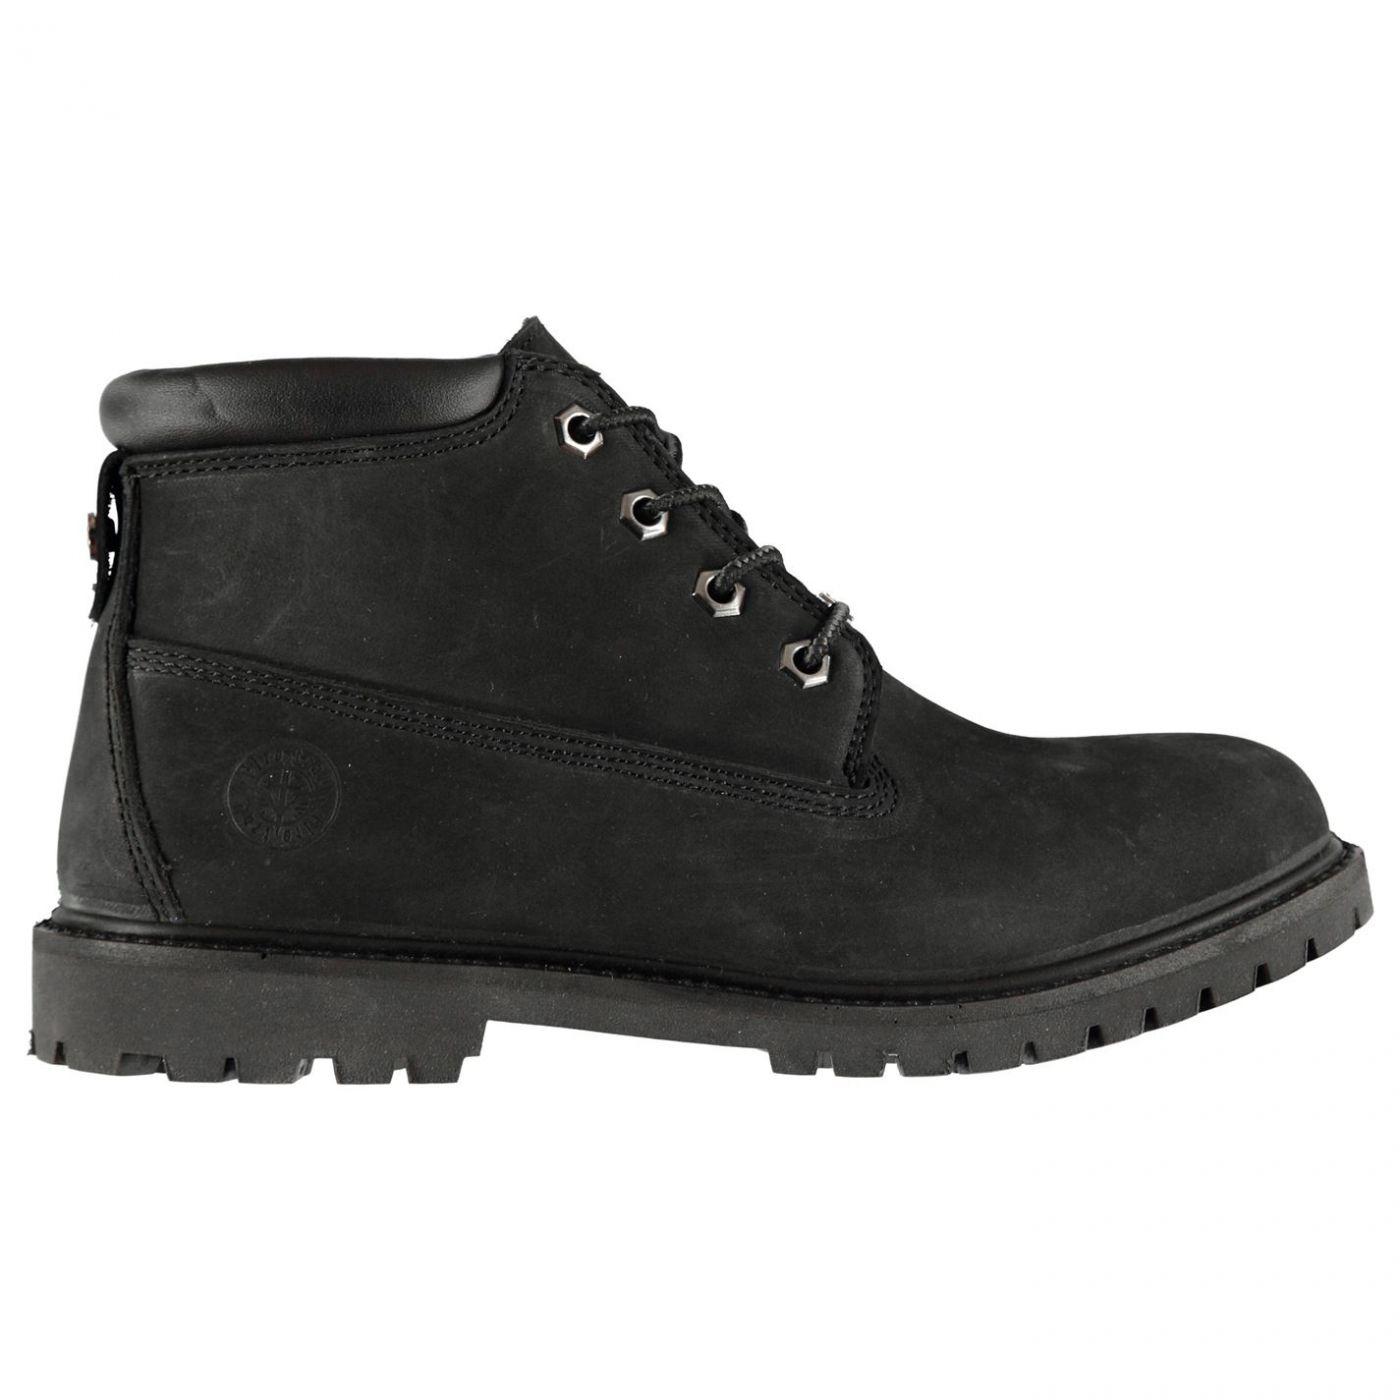 Firetrap Merlin Ladies Boots